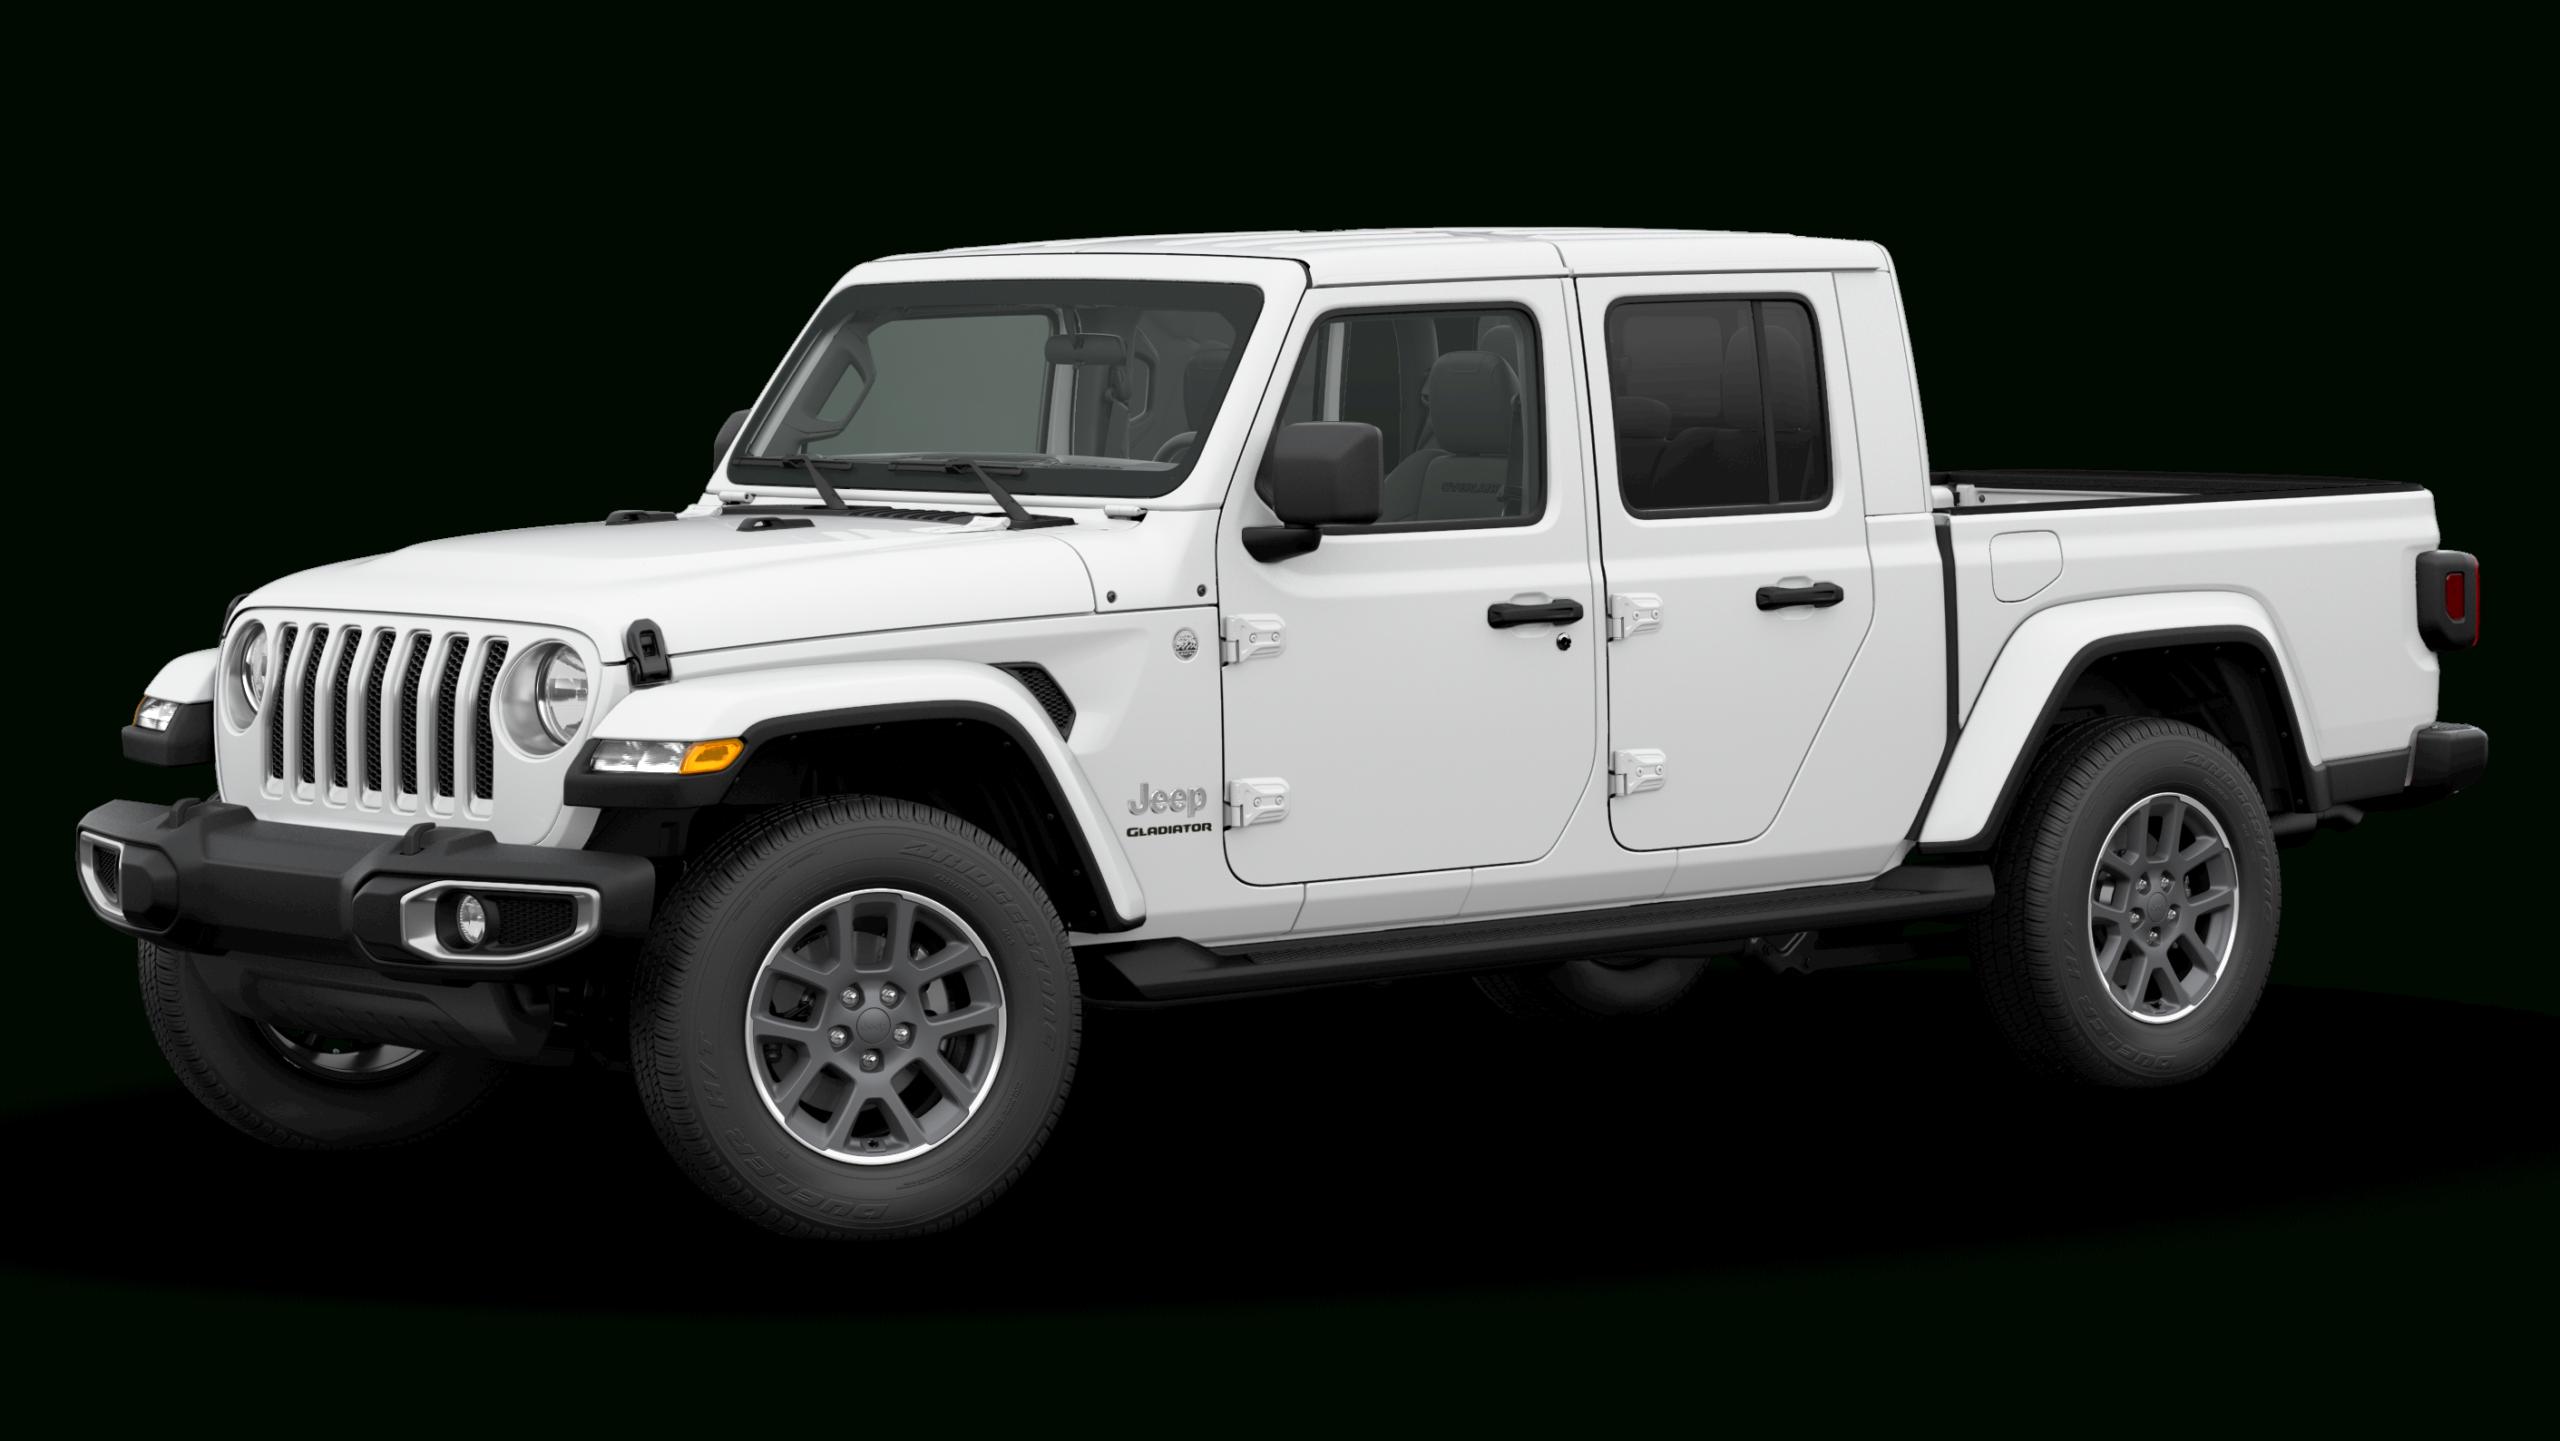 2020 Jeep Gladiator For Sale Near Me Release Date Di 2020